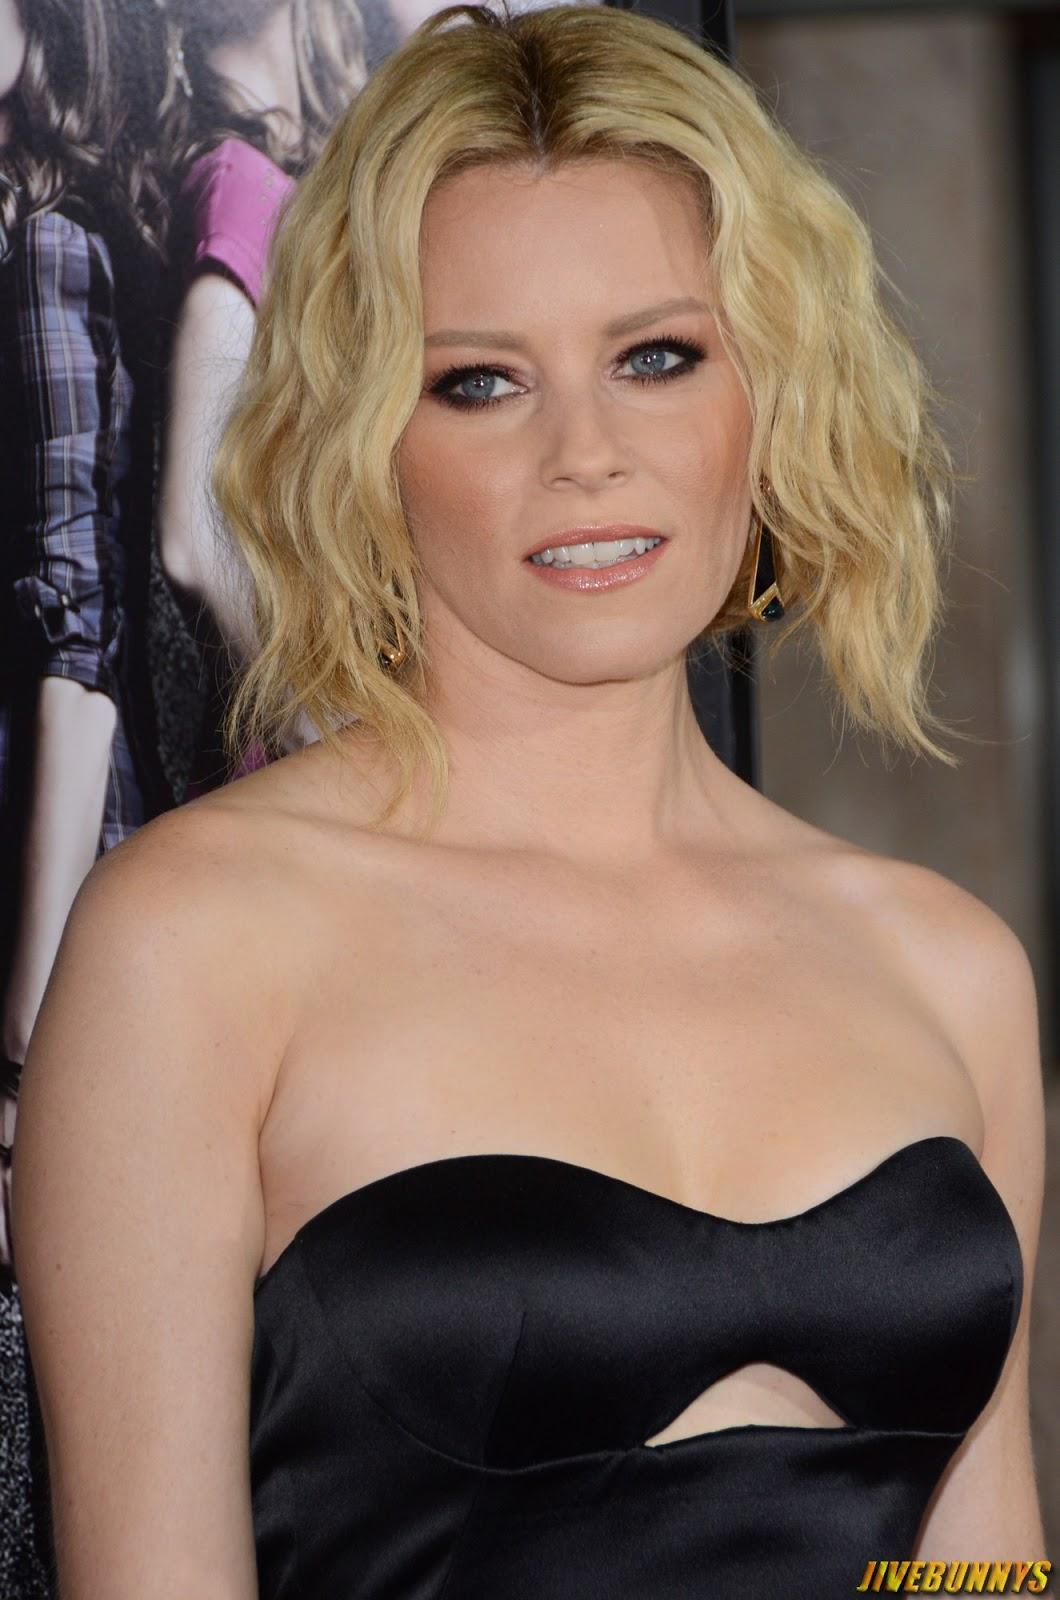 Jivebunnys Female Celebrity Picture Gallery: Elizabeth ...